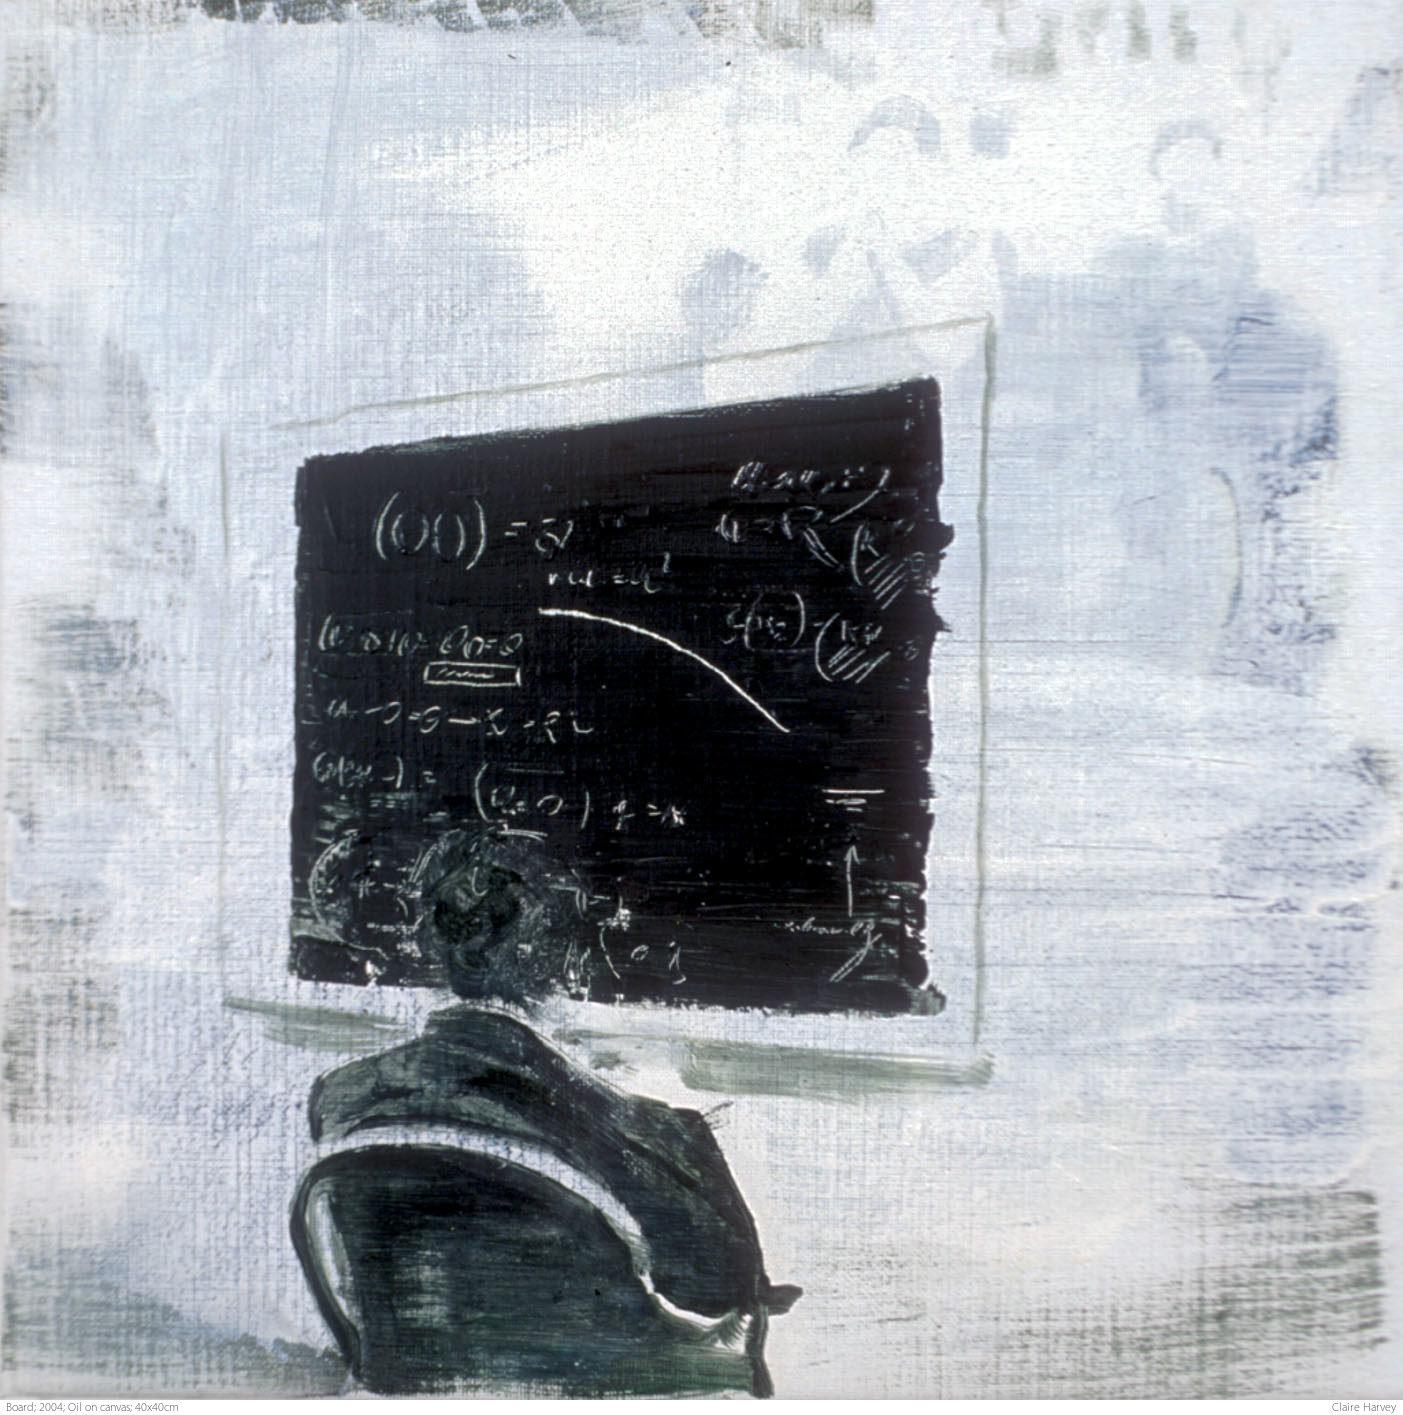 Board; 2004; Oil on canvas; 40x40cm